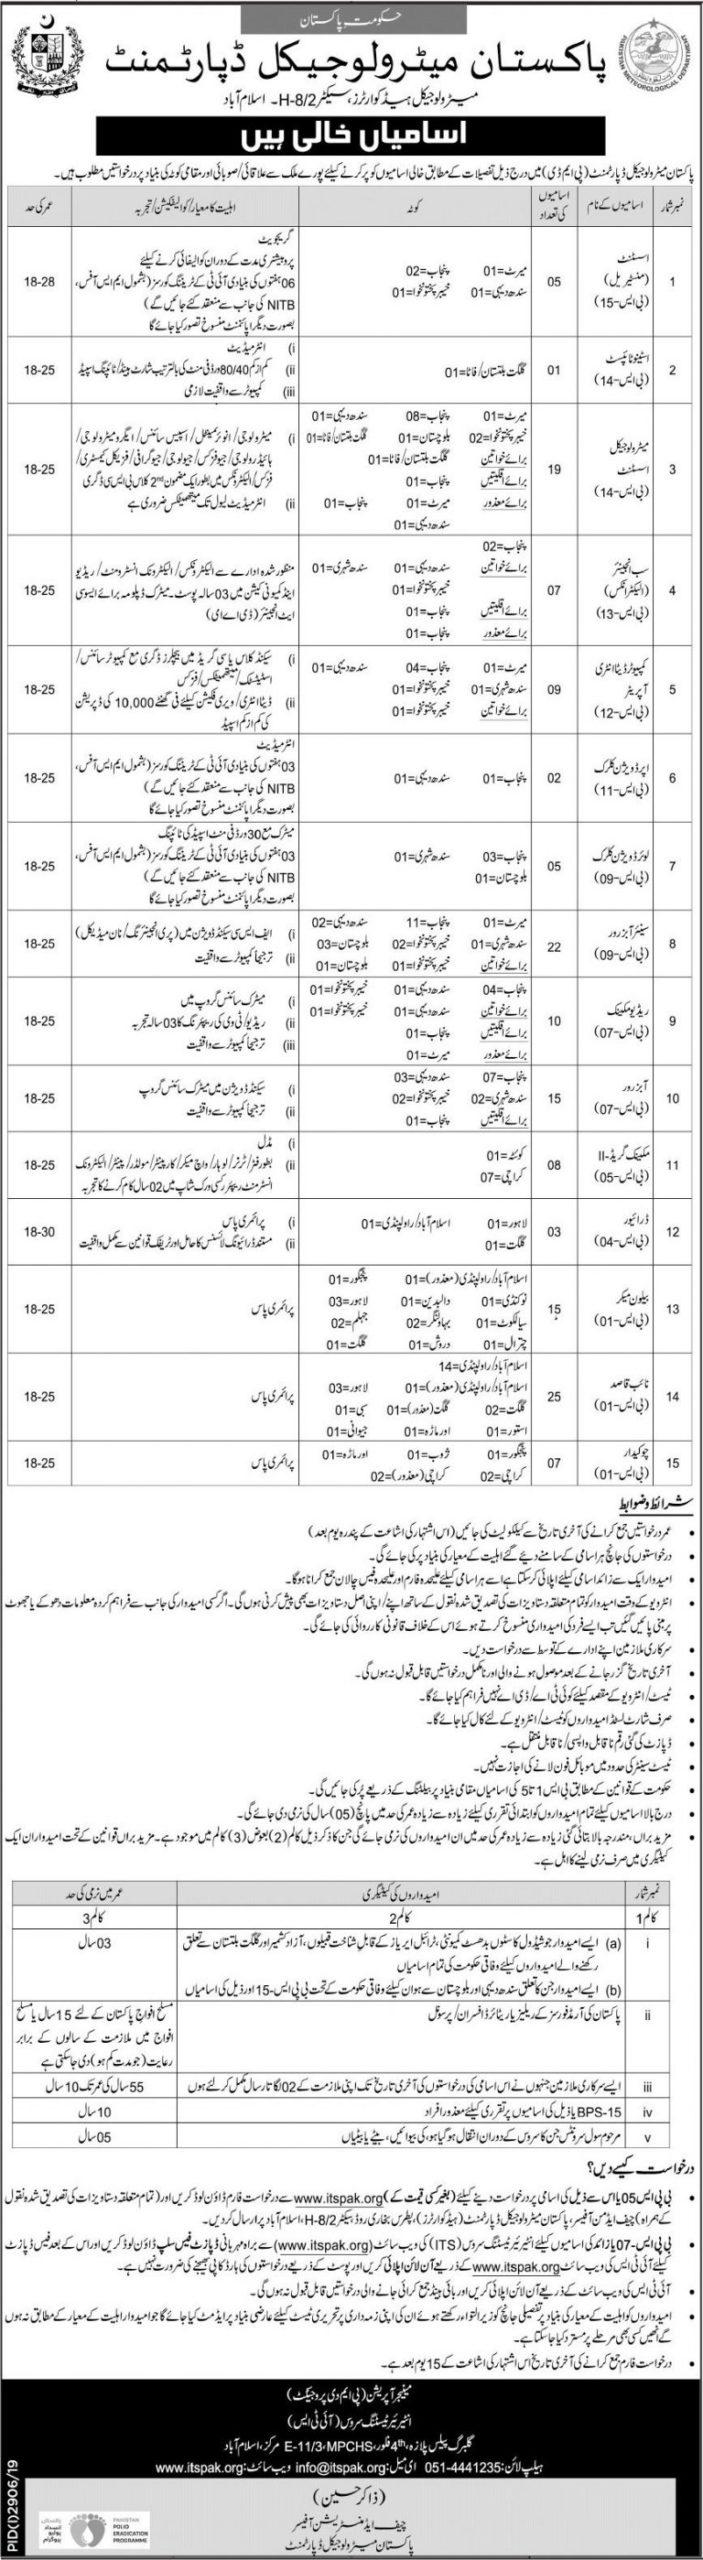 PMD Pakistan Meteorological Department Jobs ITSPAK Result Interior testing Services